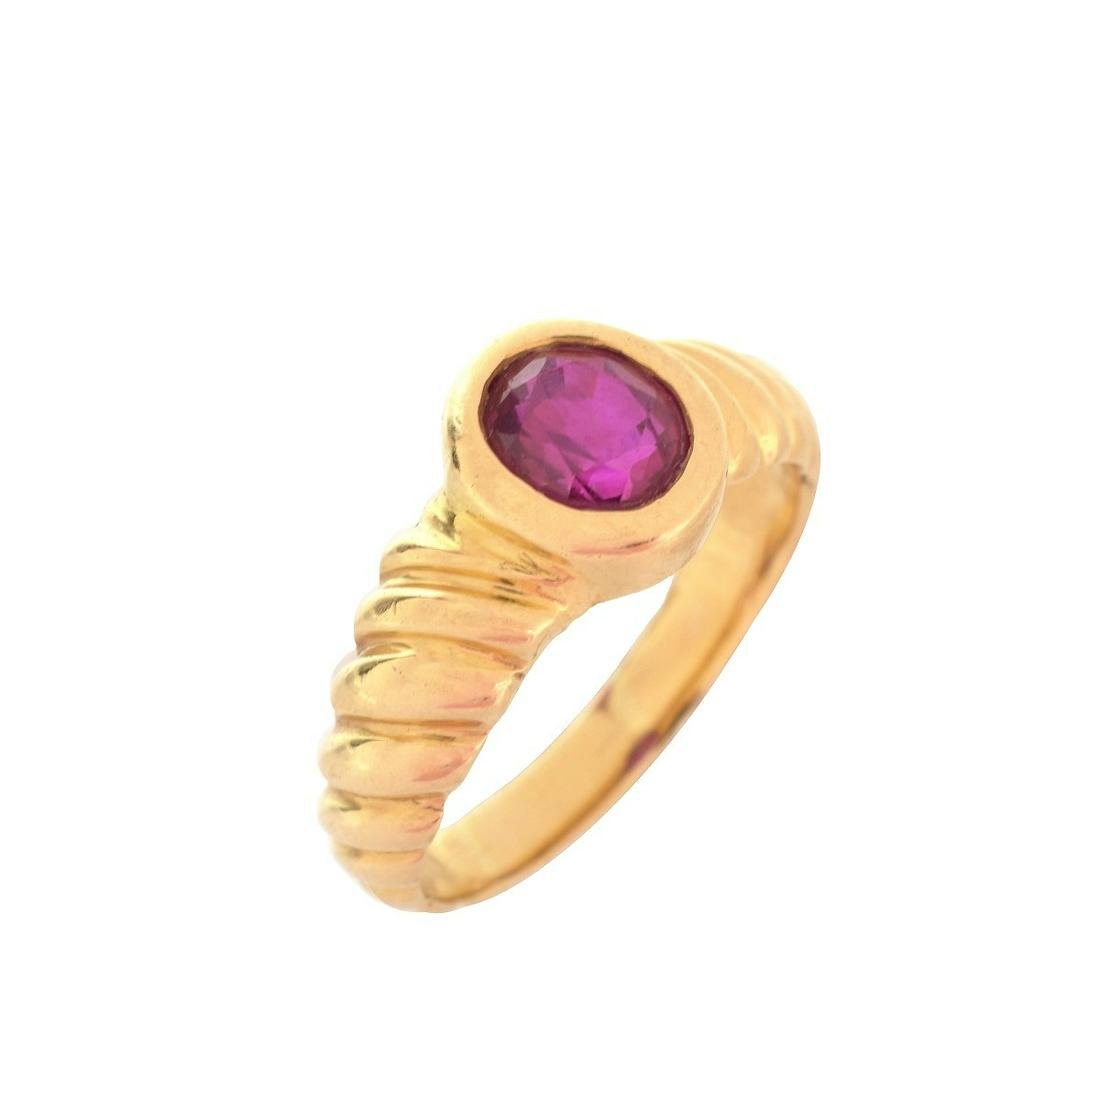 GRS Burma Ruby and 18K Ring